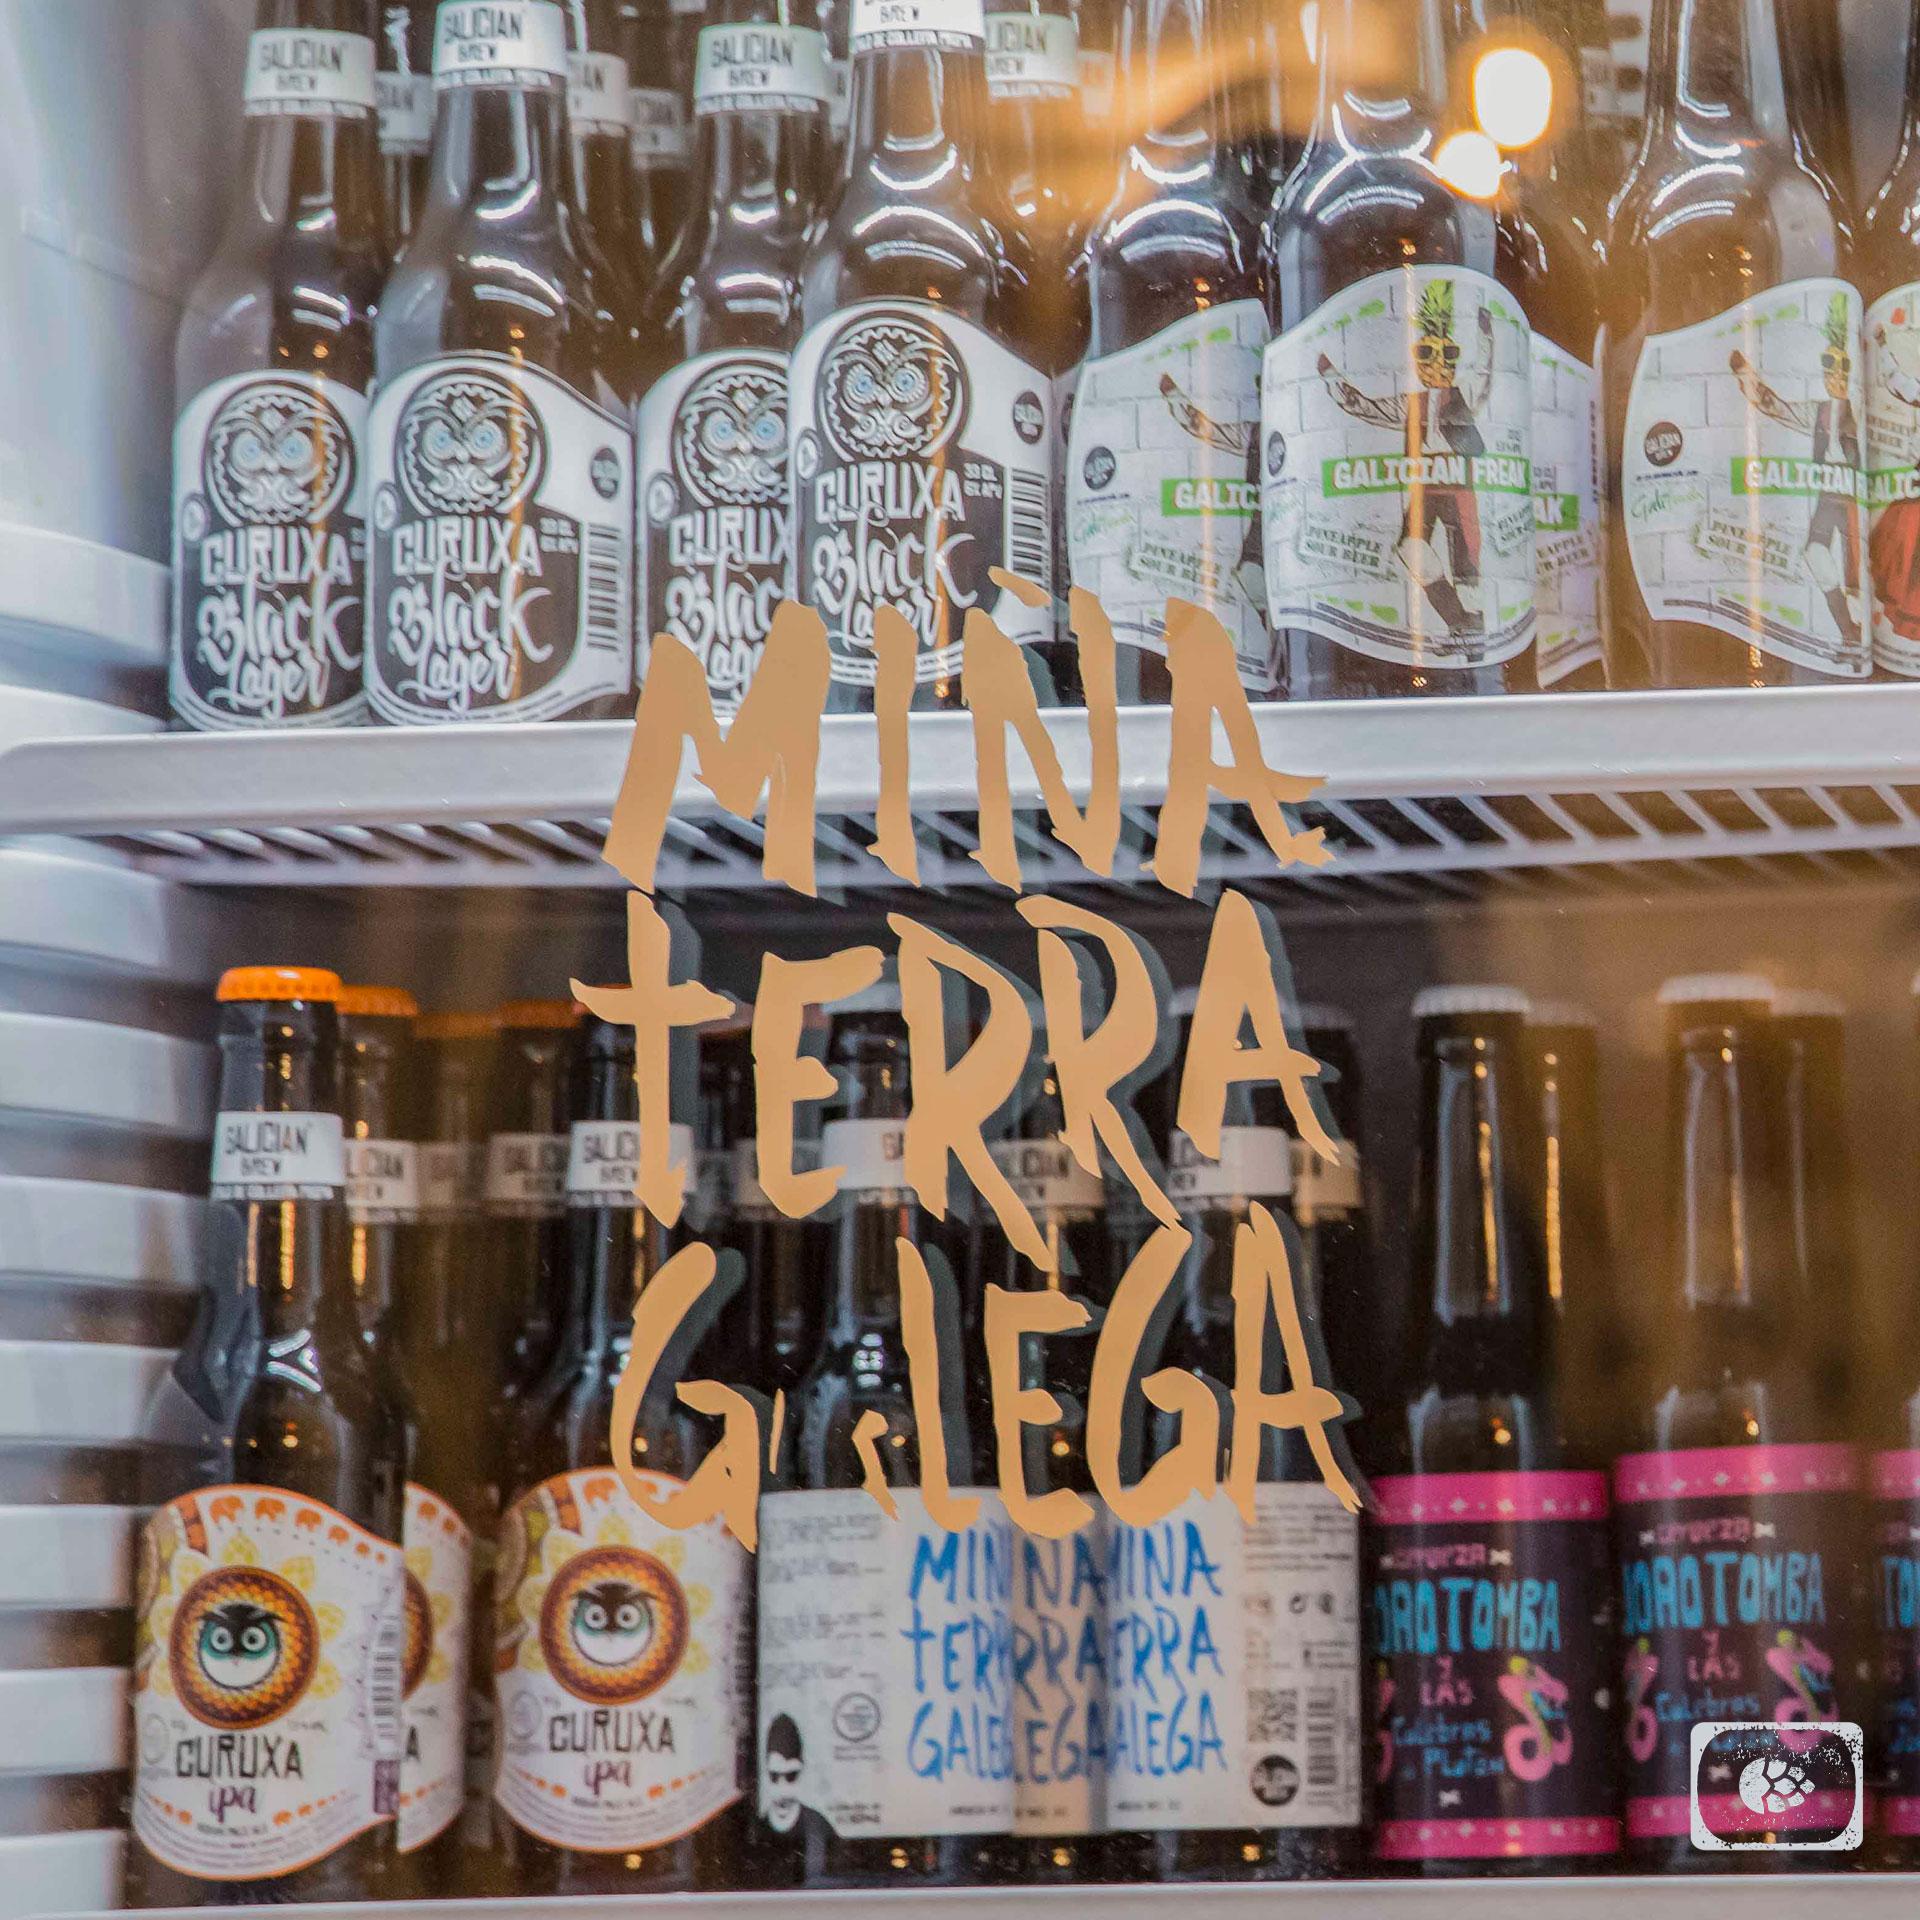 Galician Brew